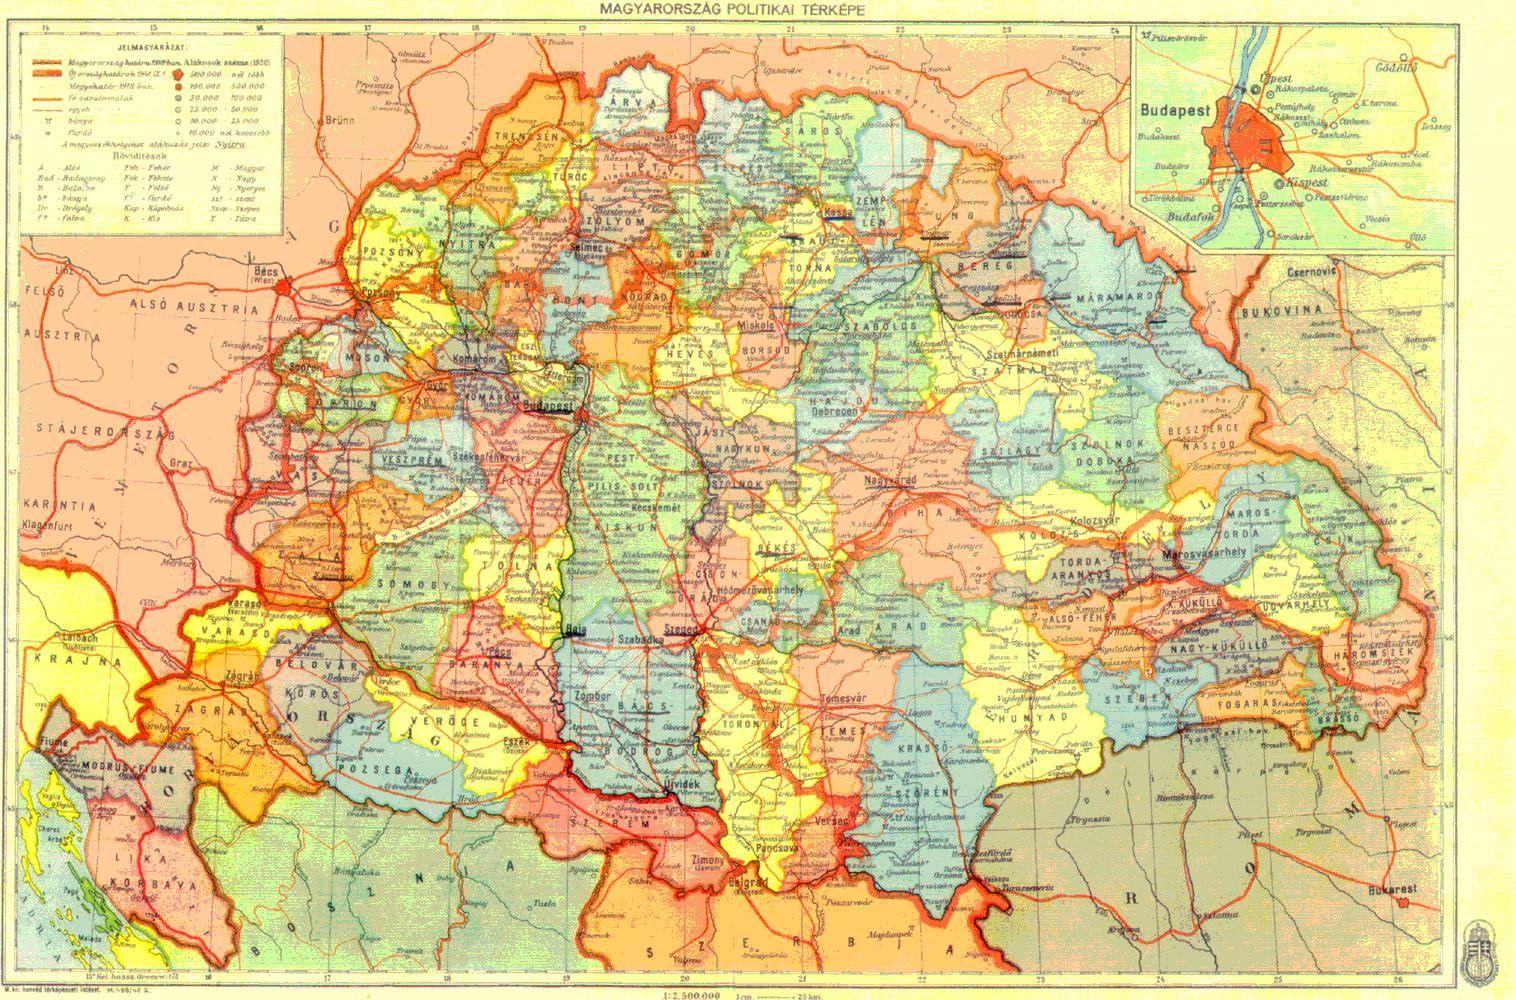 Keptalalat A Kovetkezore Magyar Magyar Kiralysag 1940 Ben